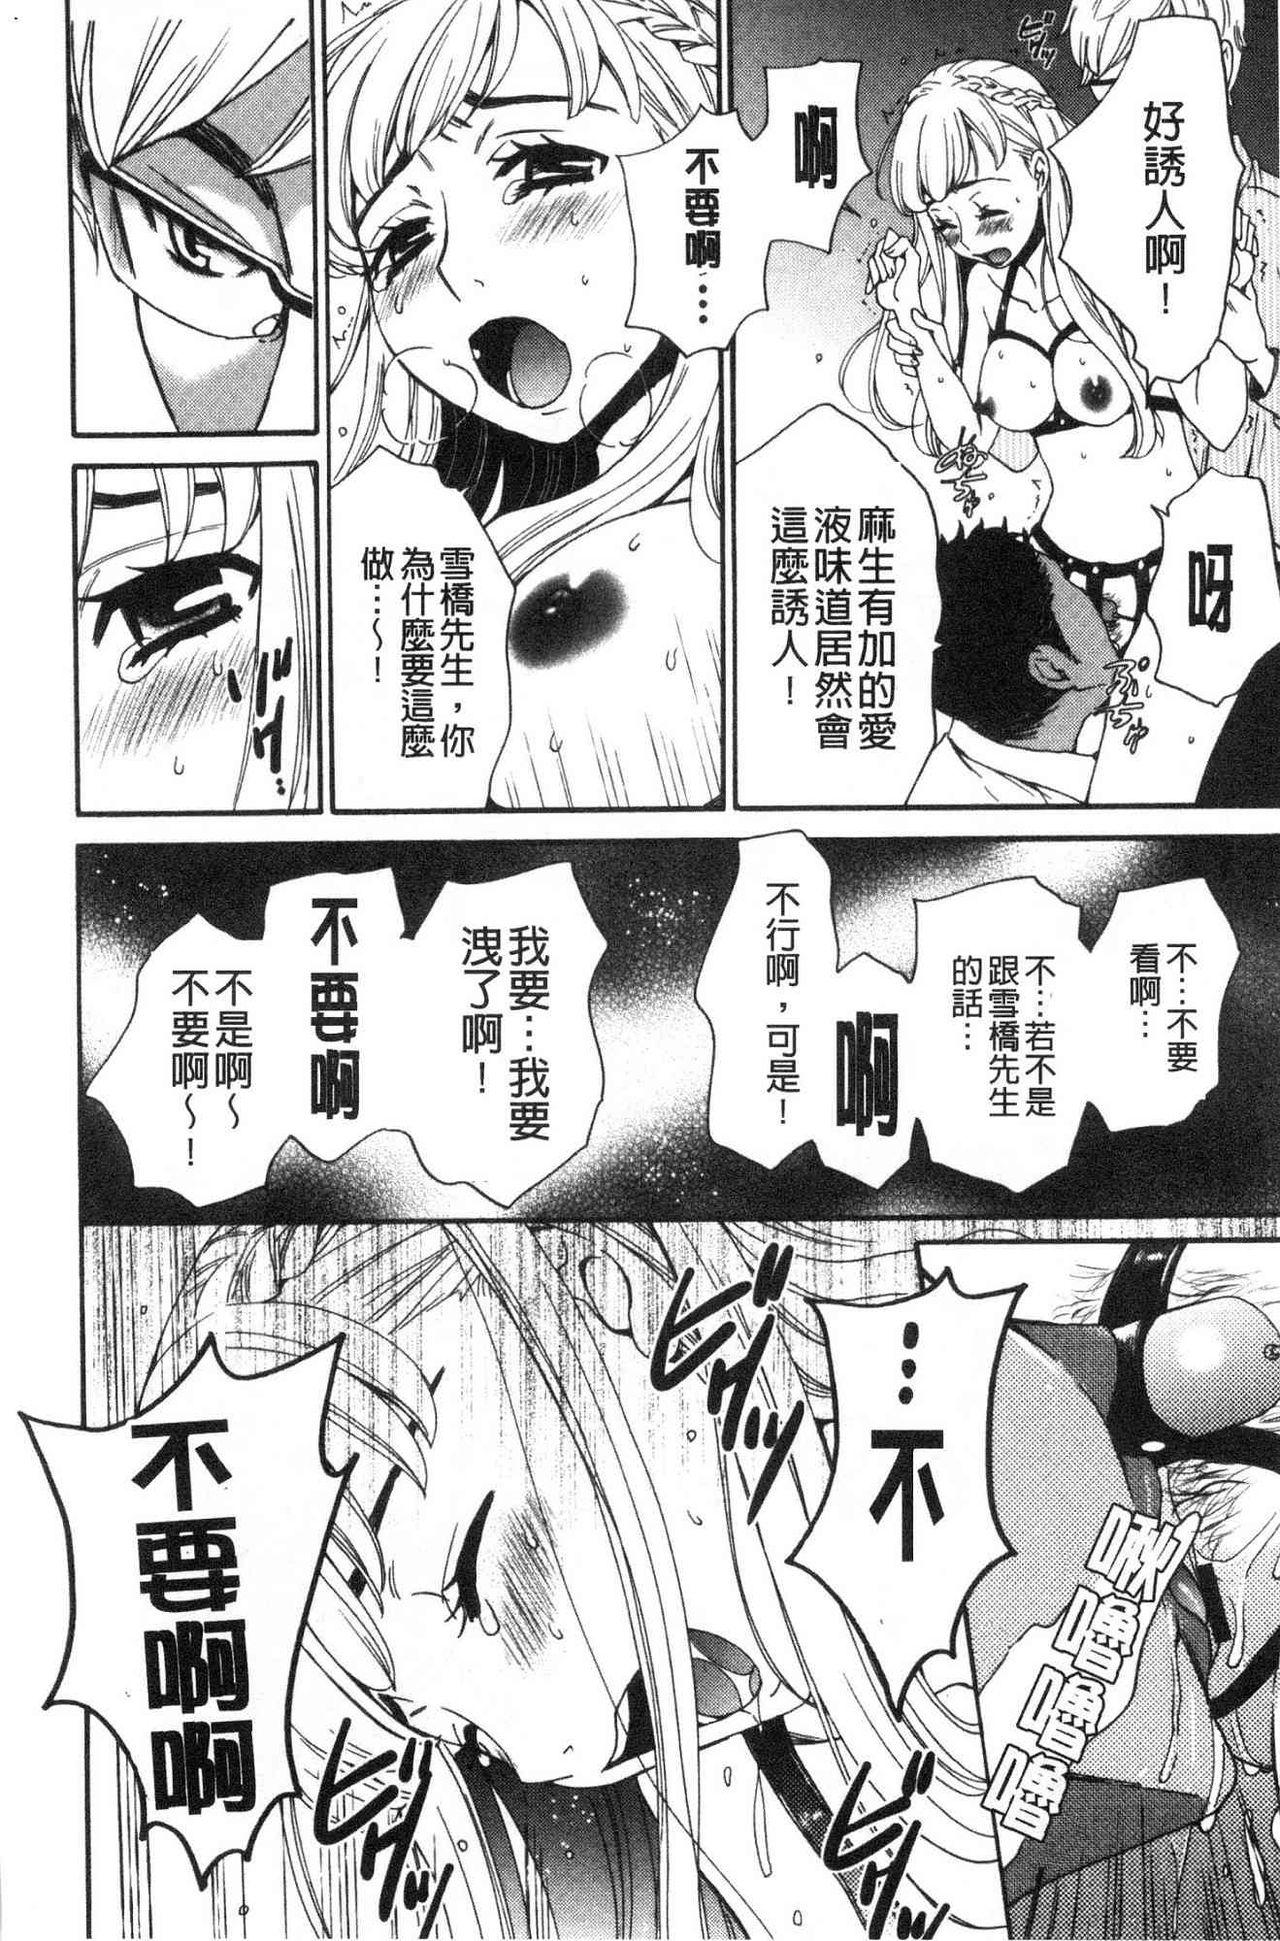 [Gotoh Akira]  21-ji no Onna ~Camera no Mae no Mesuinu~ 2 | 21時之女 ~鏡頭前的牝犬~ 2 [Chinese] 17